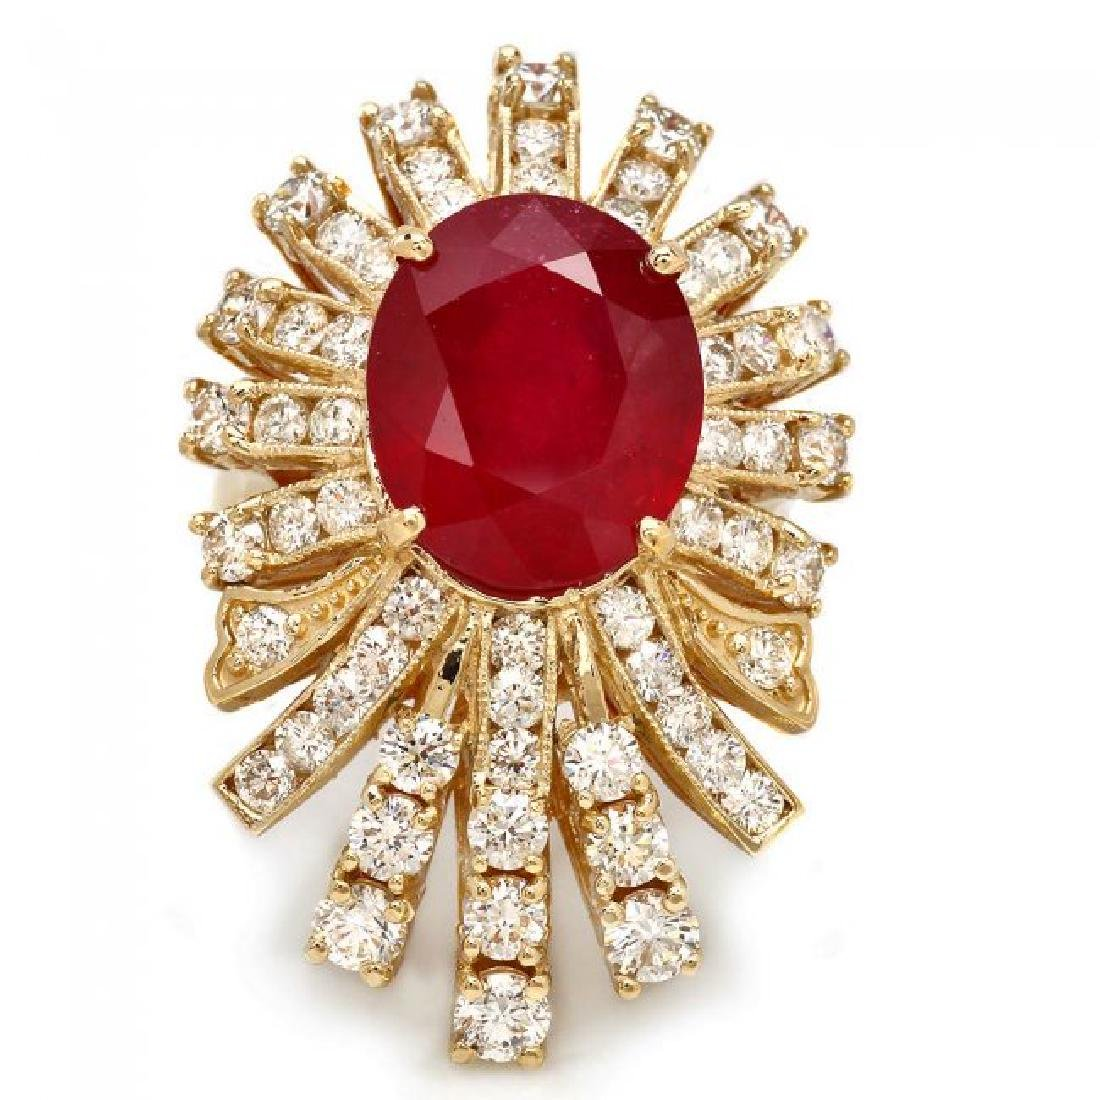 14k Yellow Gold 8.50ct Ruby 2.75ct Diamond Ring - 2